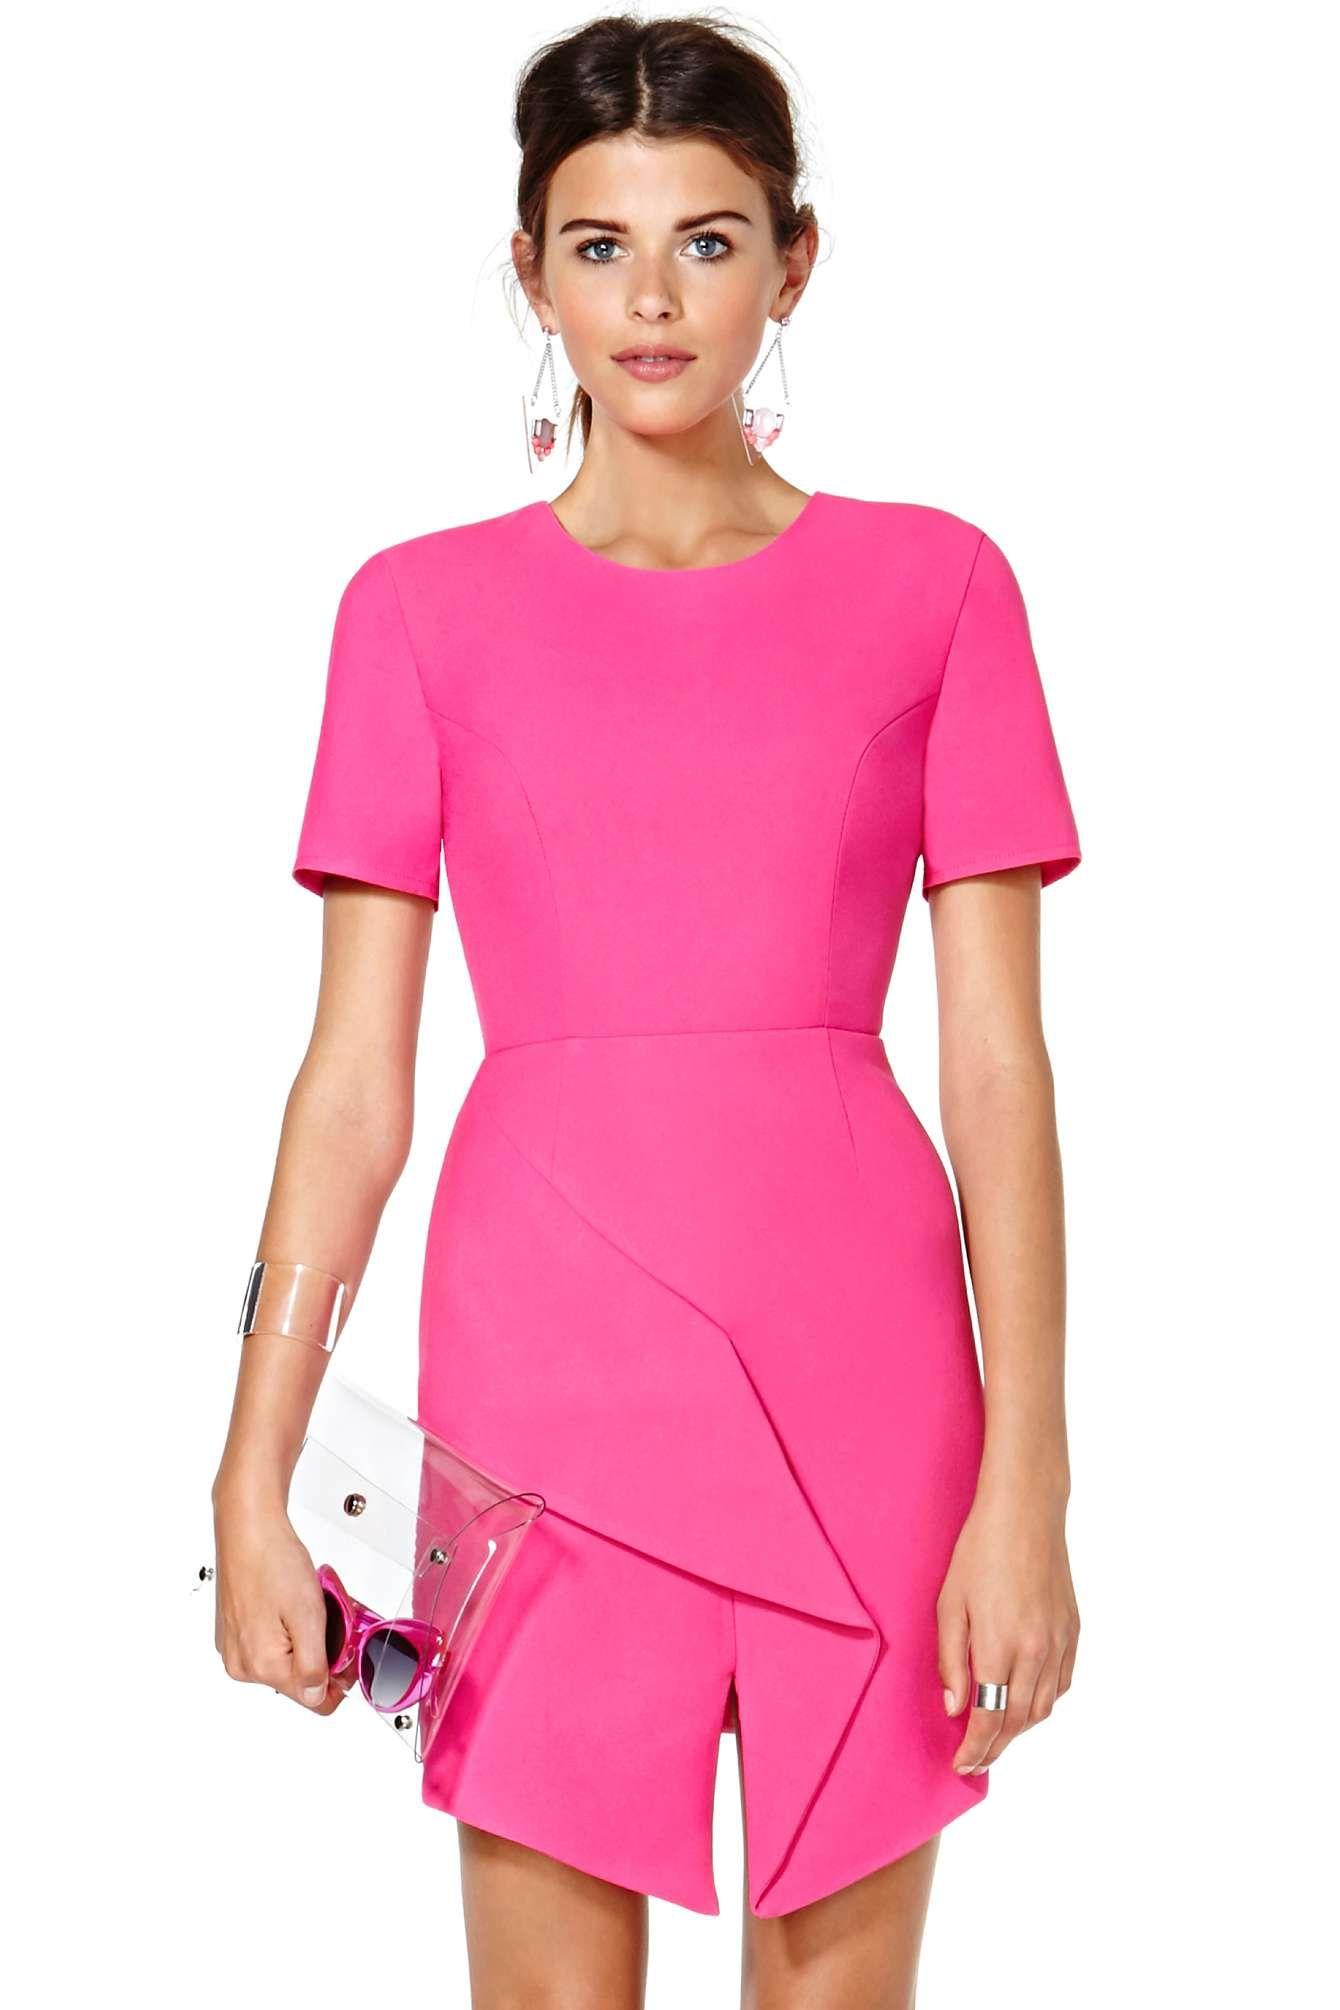 Pink dress shirt for women  Crochet Whatus Up Hello Lace Dress  Keepsakes Shops and Dress shops